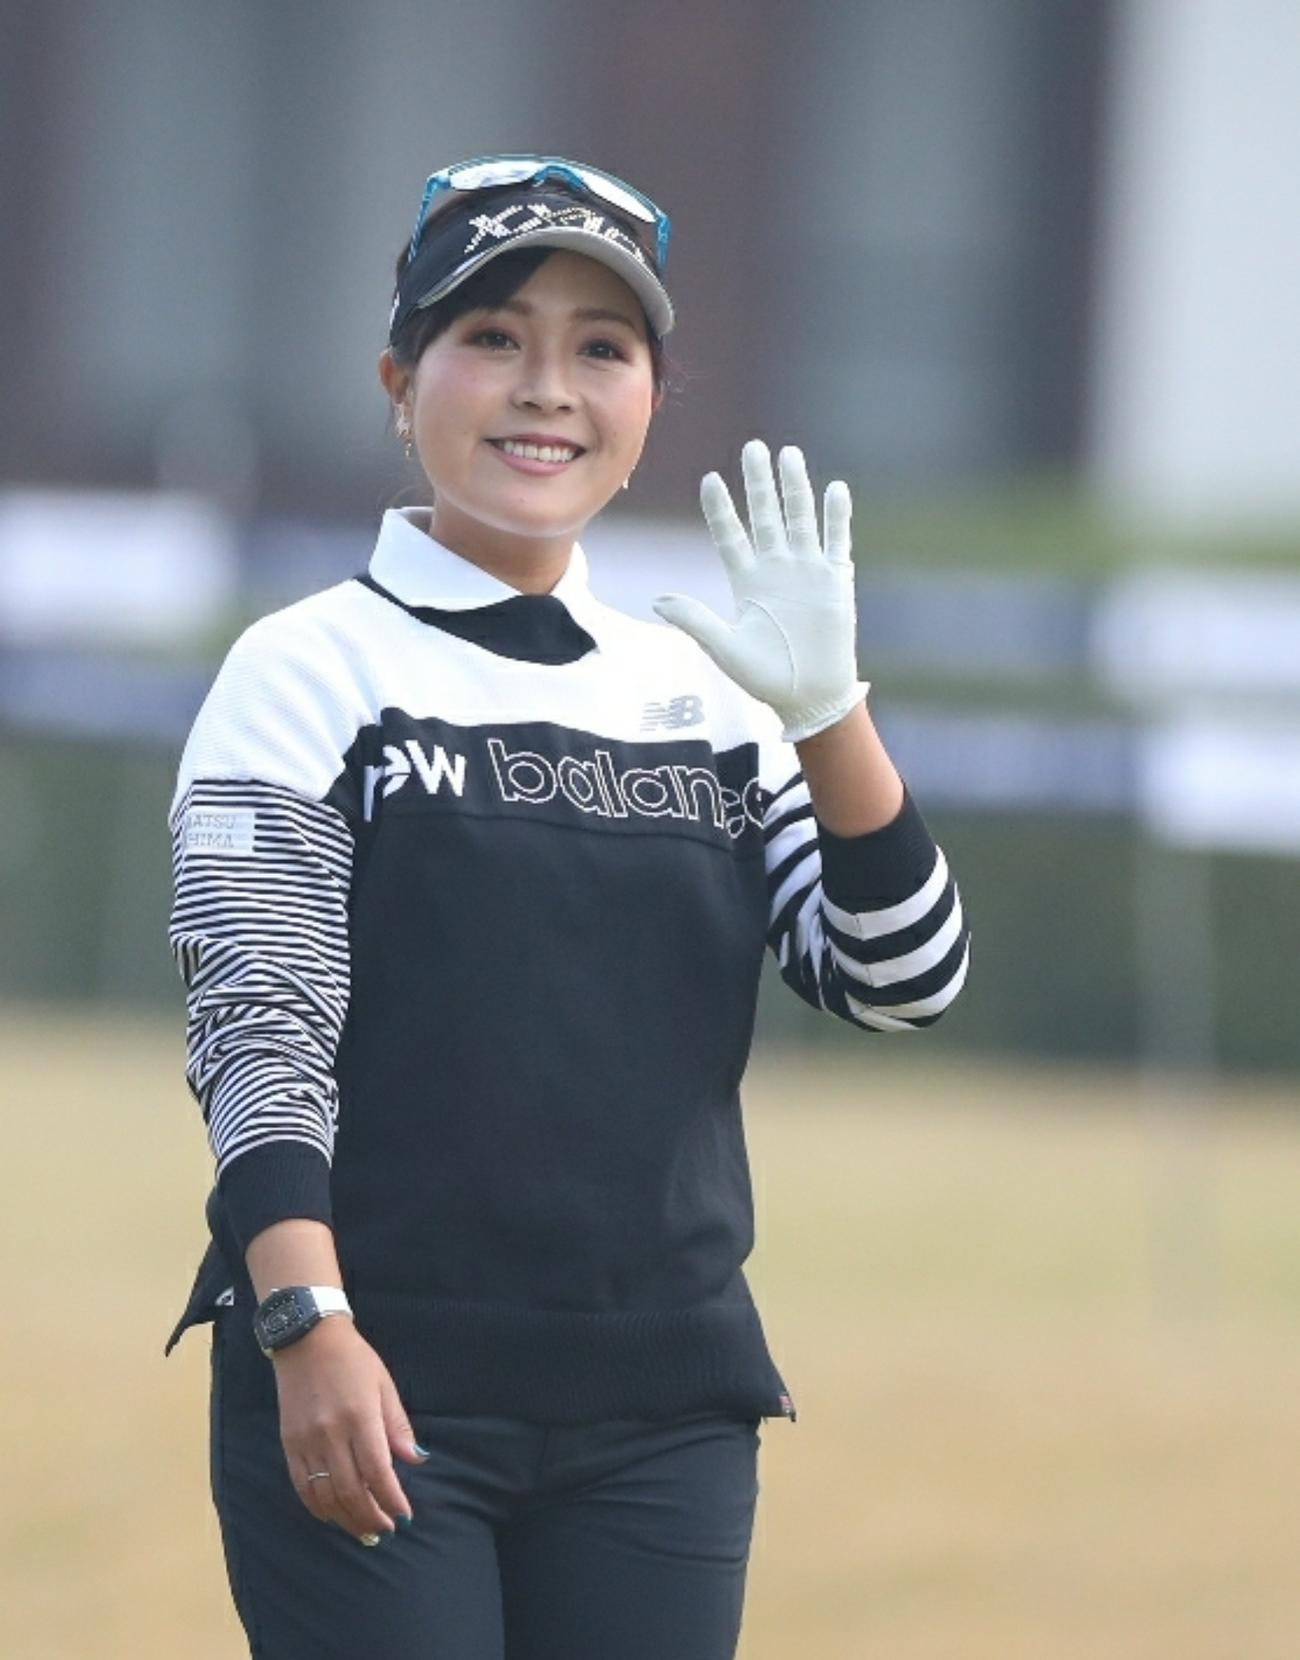 https://www.nikkansports.com/sports/golf/news/img/202011080000118-w1300_0.jpg